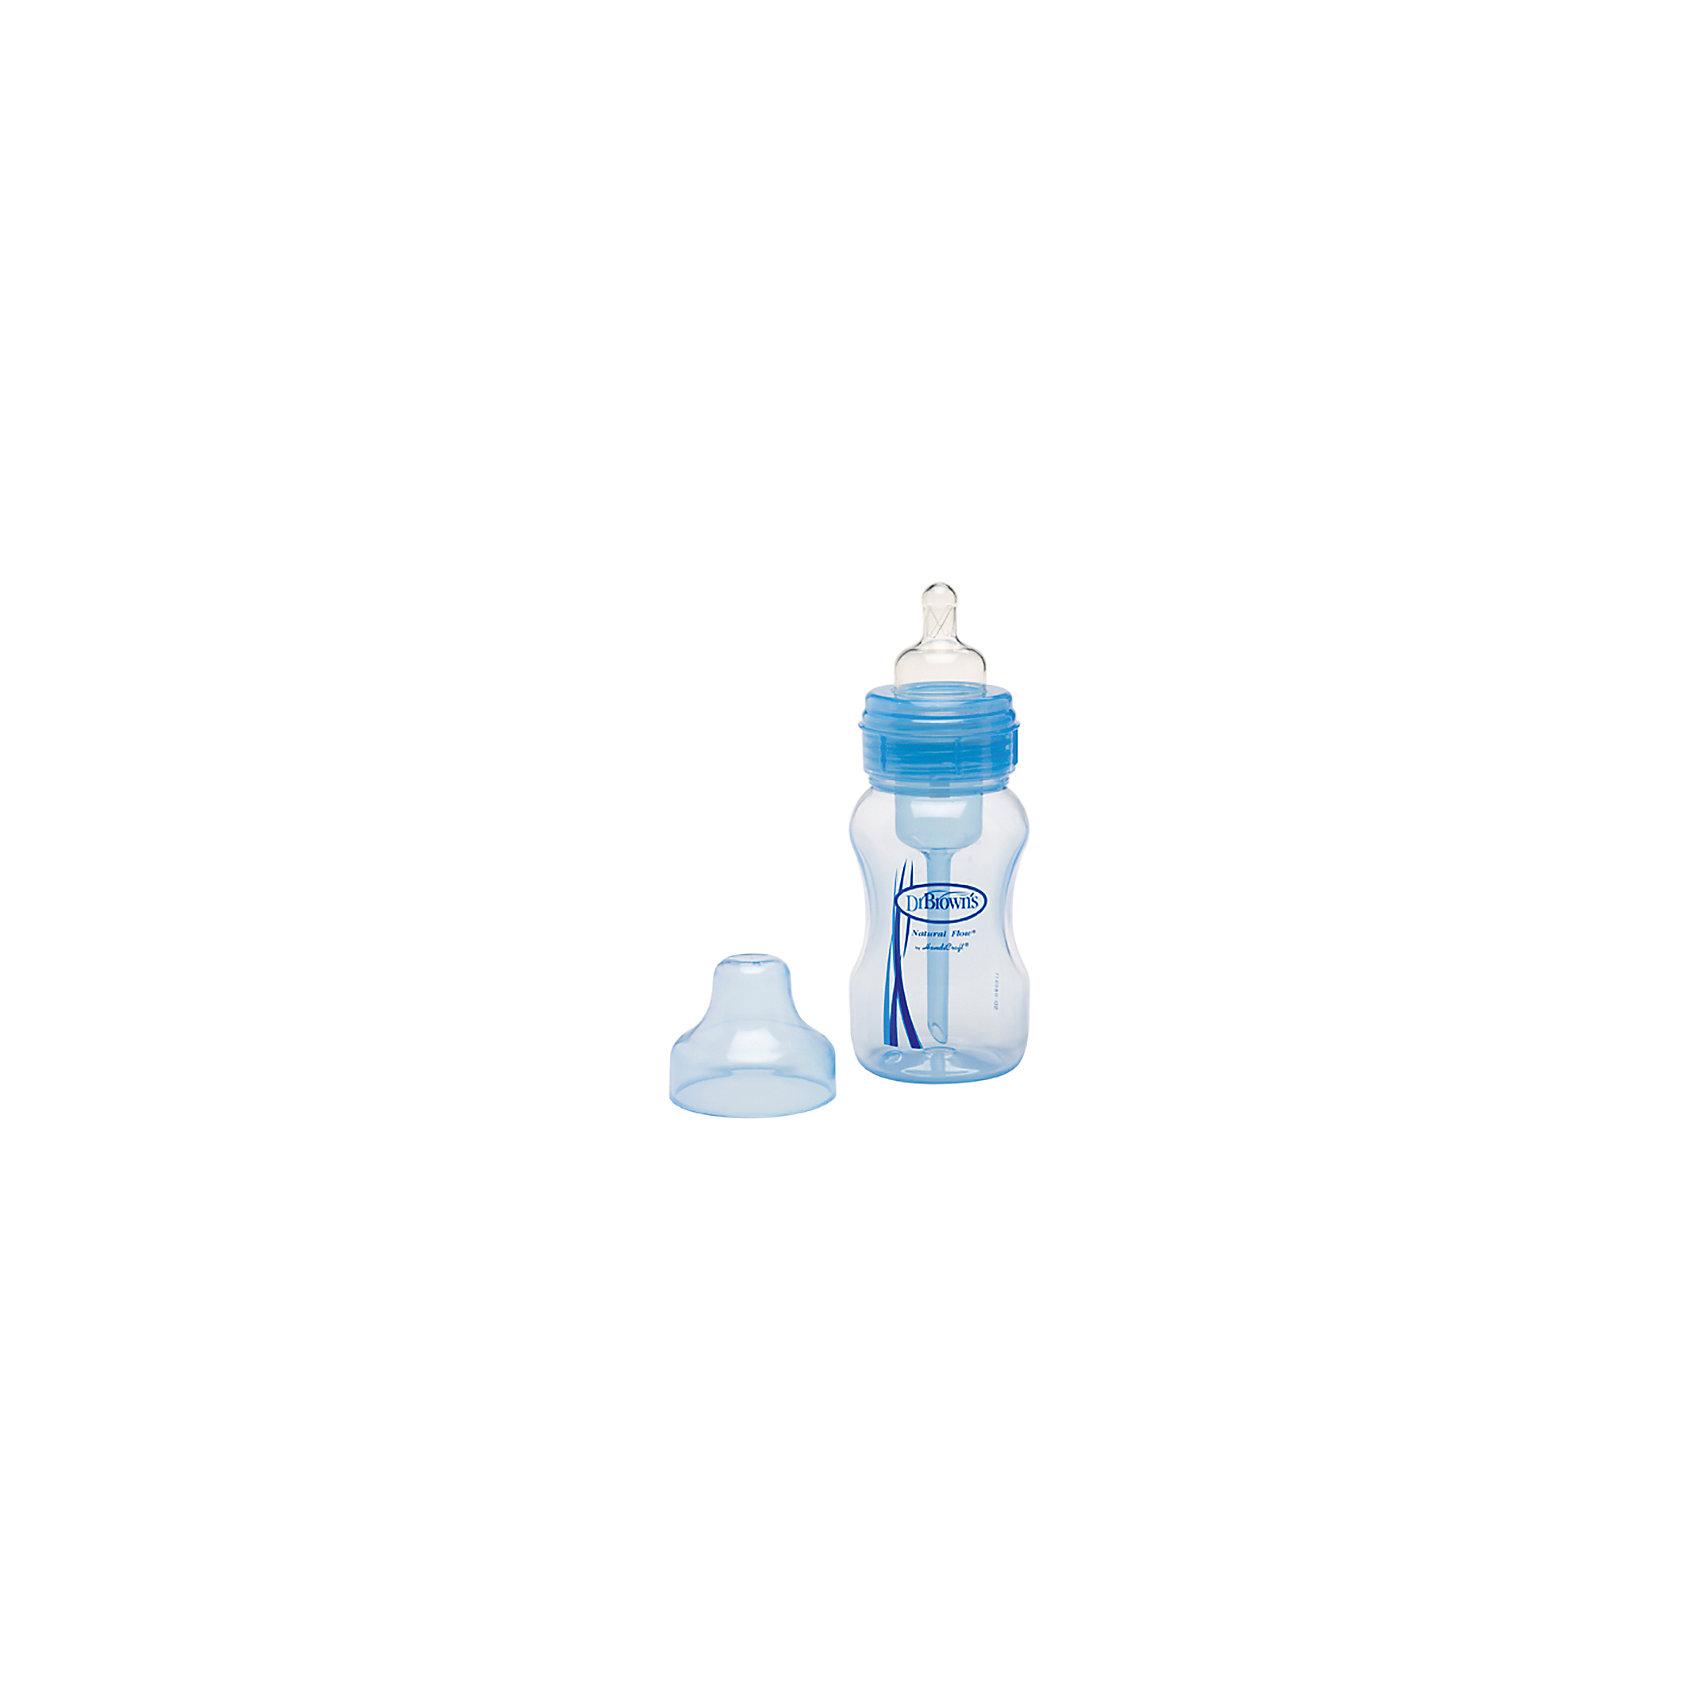 Dr.Brown's Бутылочка с широким горлышком 240 мл, полипропилен, Dr. Brown, синий